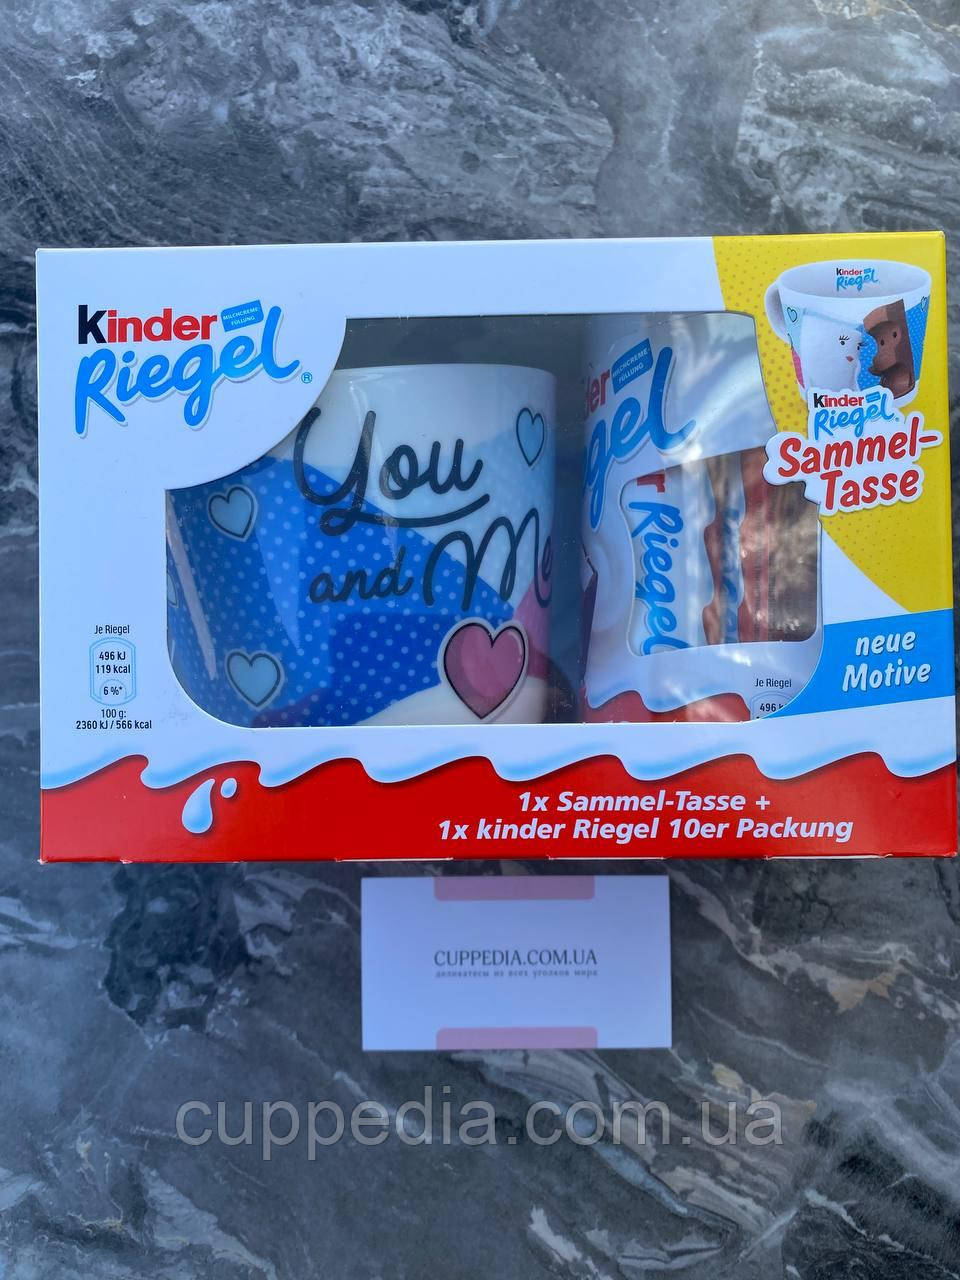 Набор Kinder Riegel 210 грм и чашка от бренда Kinder